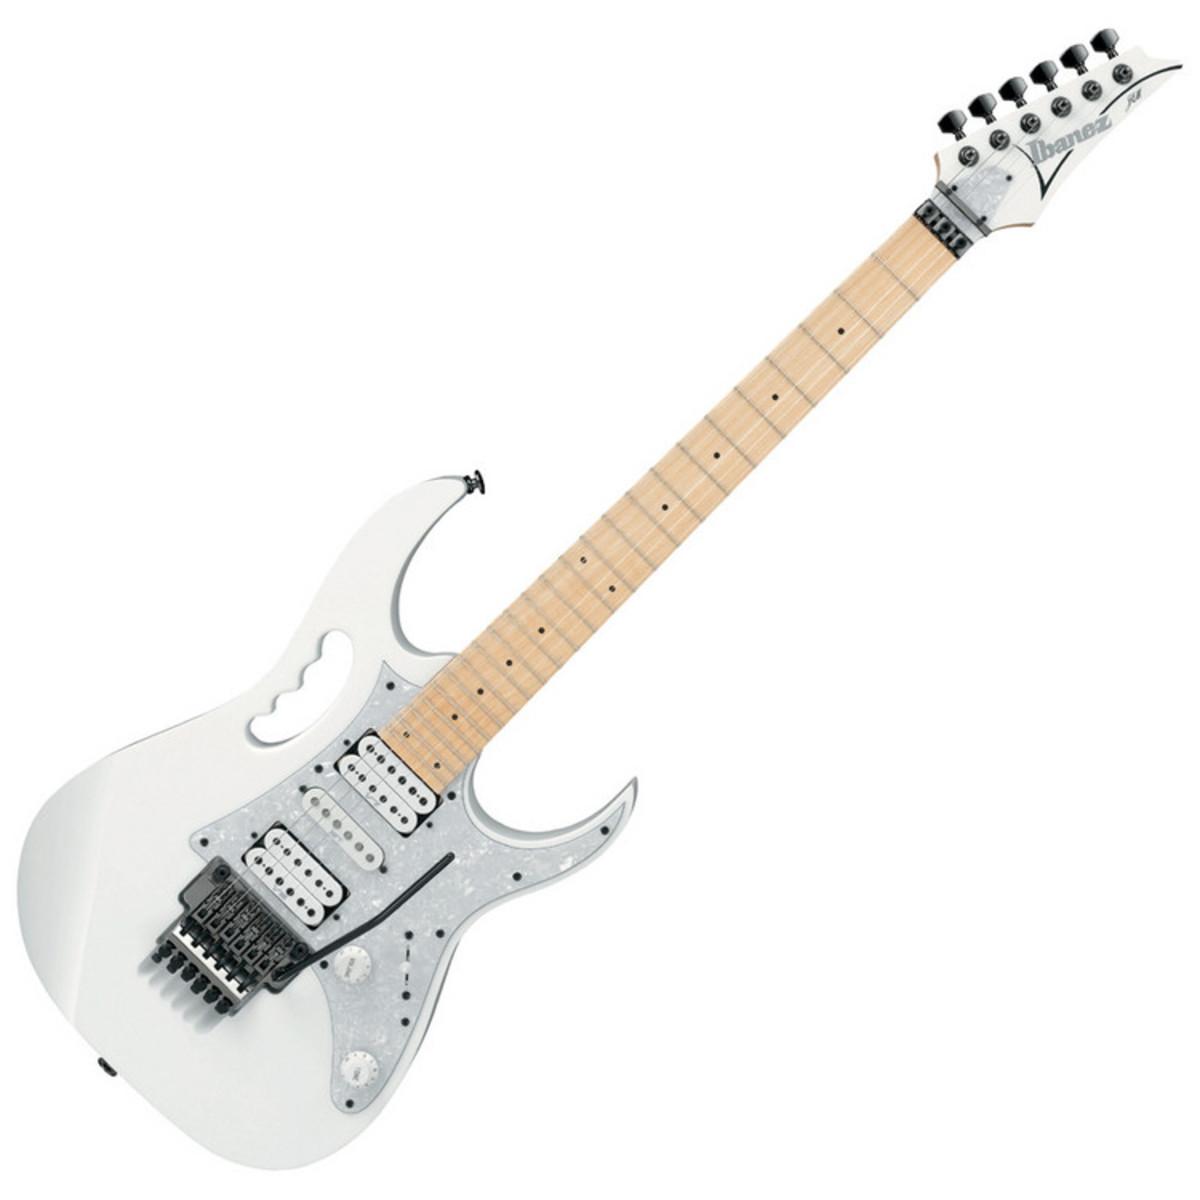 ibanez jem505 steve vai signature electric guitar white at. Black Bedroom Furniture Sets. Home Design Ideas